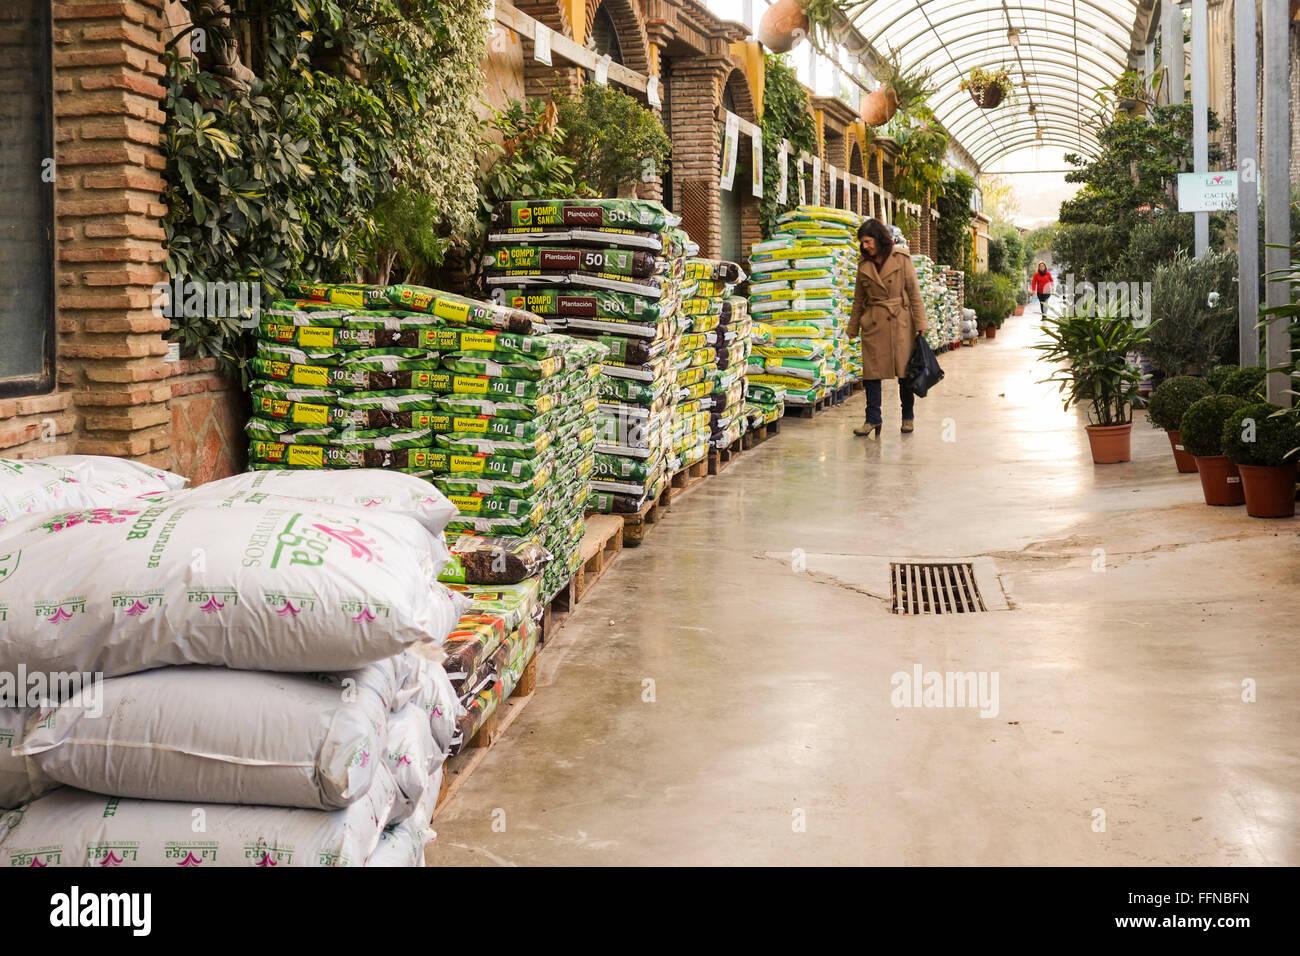 Woman at Garden centre, offering plants, compost, fertilizers, Spain. - Stock Image